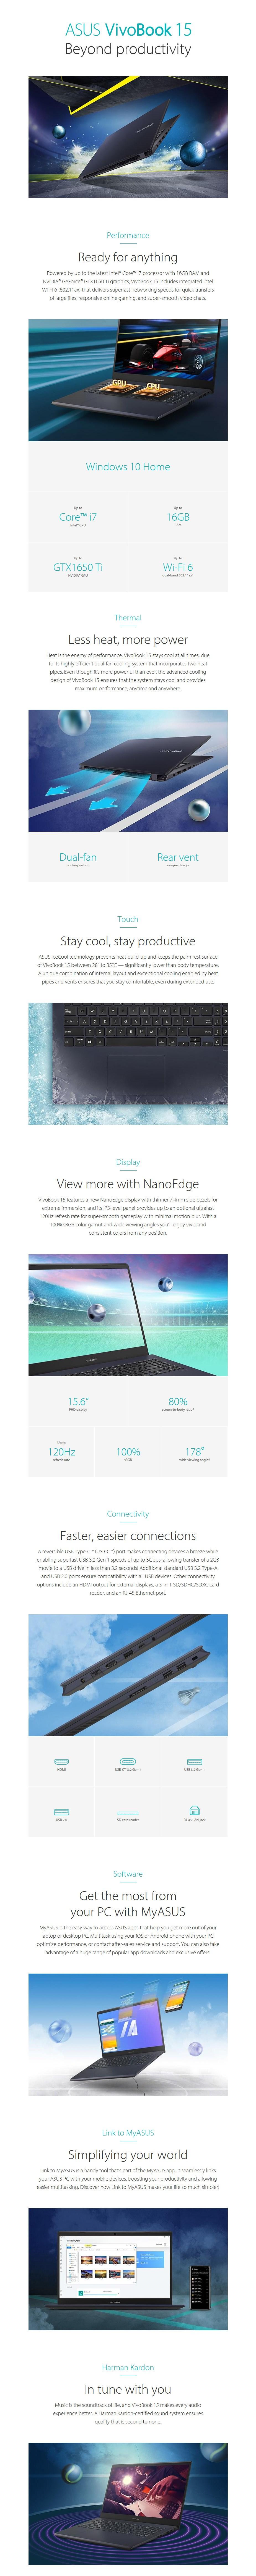 "ASUS VivoBook 15 X571LI 15.6"" 120Hz Laptop i7-10750H 16GB 512GB 1650Ti W10H - Overview 1"